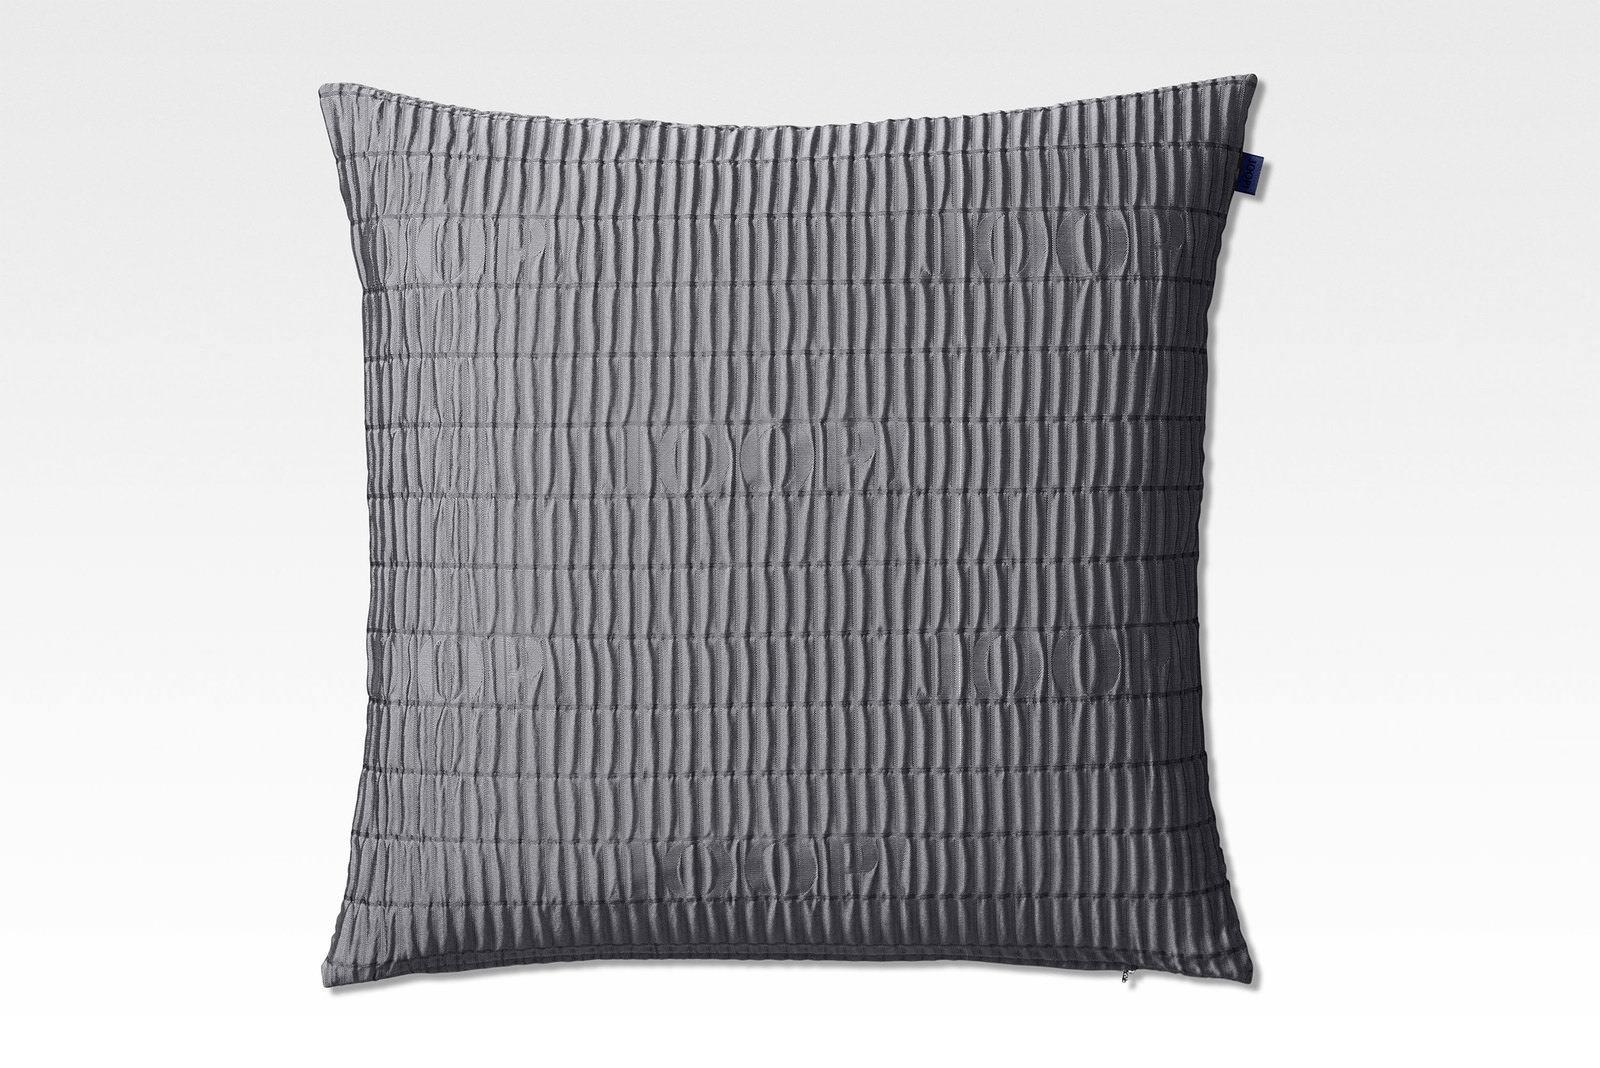 joop joop kissenh lle grau online entdecken knuffmann ihr m belhaus. Black Bedroom Furniture Sets. Home Design Ideas